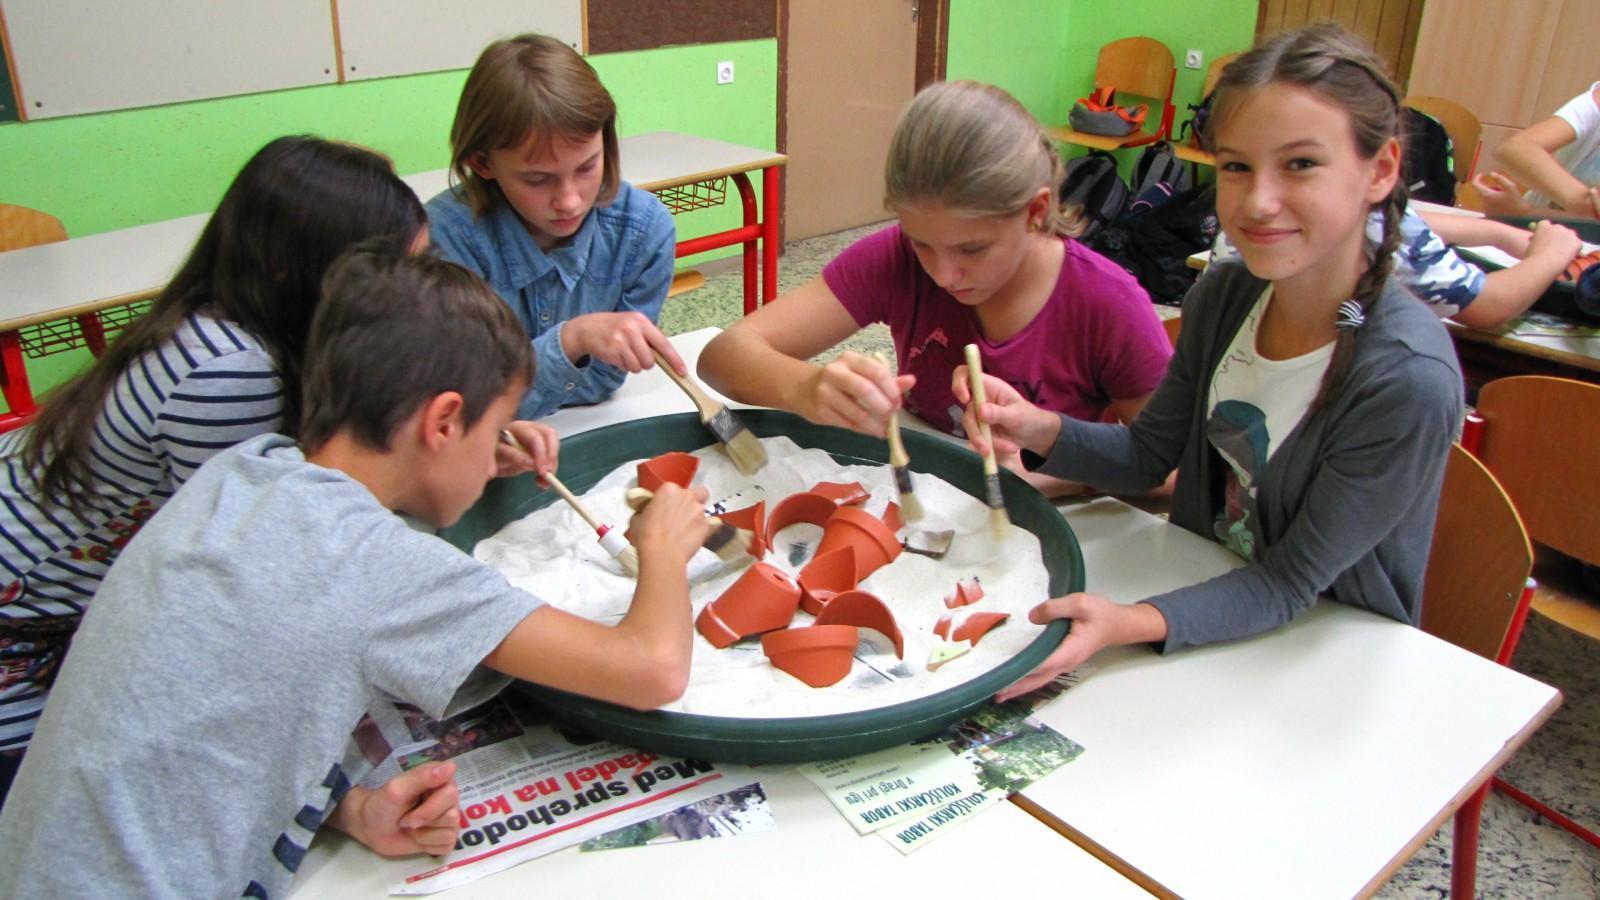 arheologija, raziskave, izkopavanja